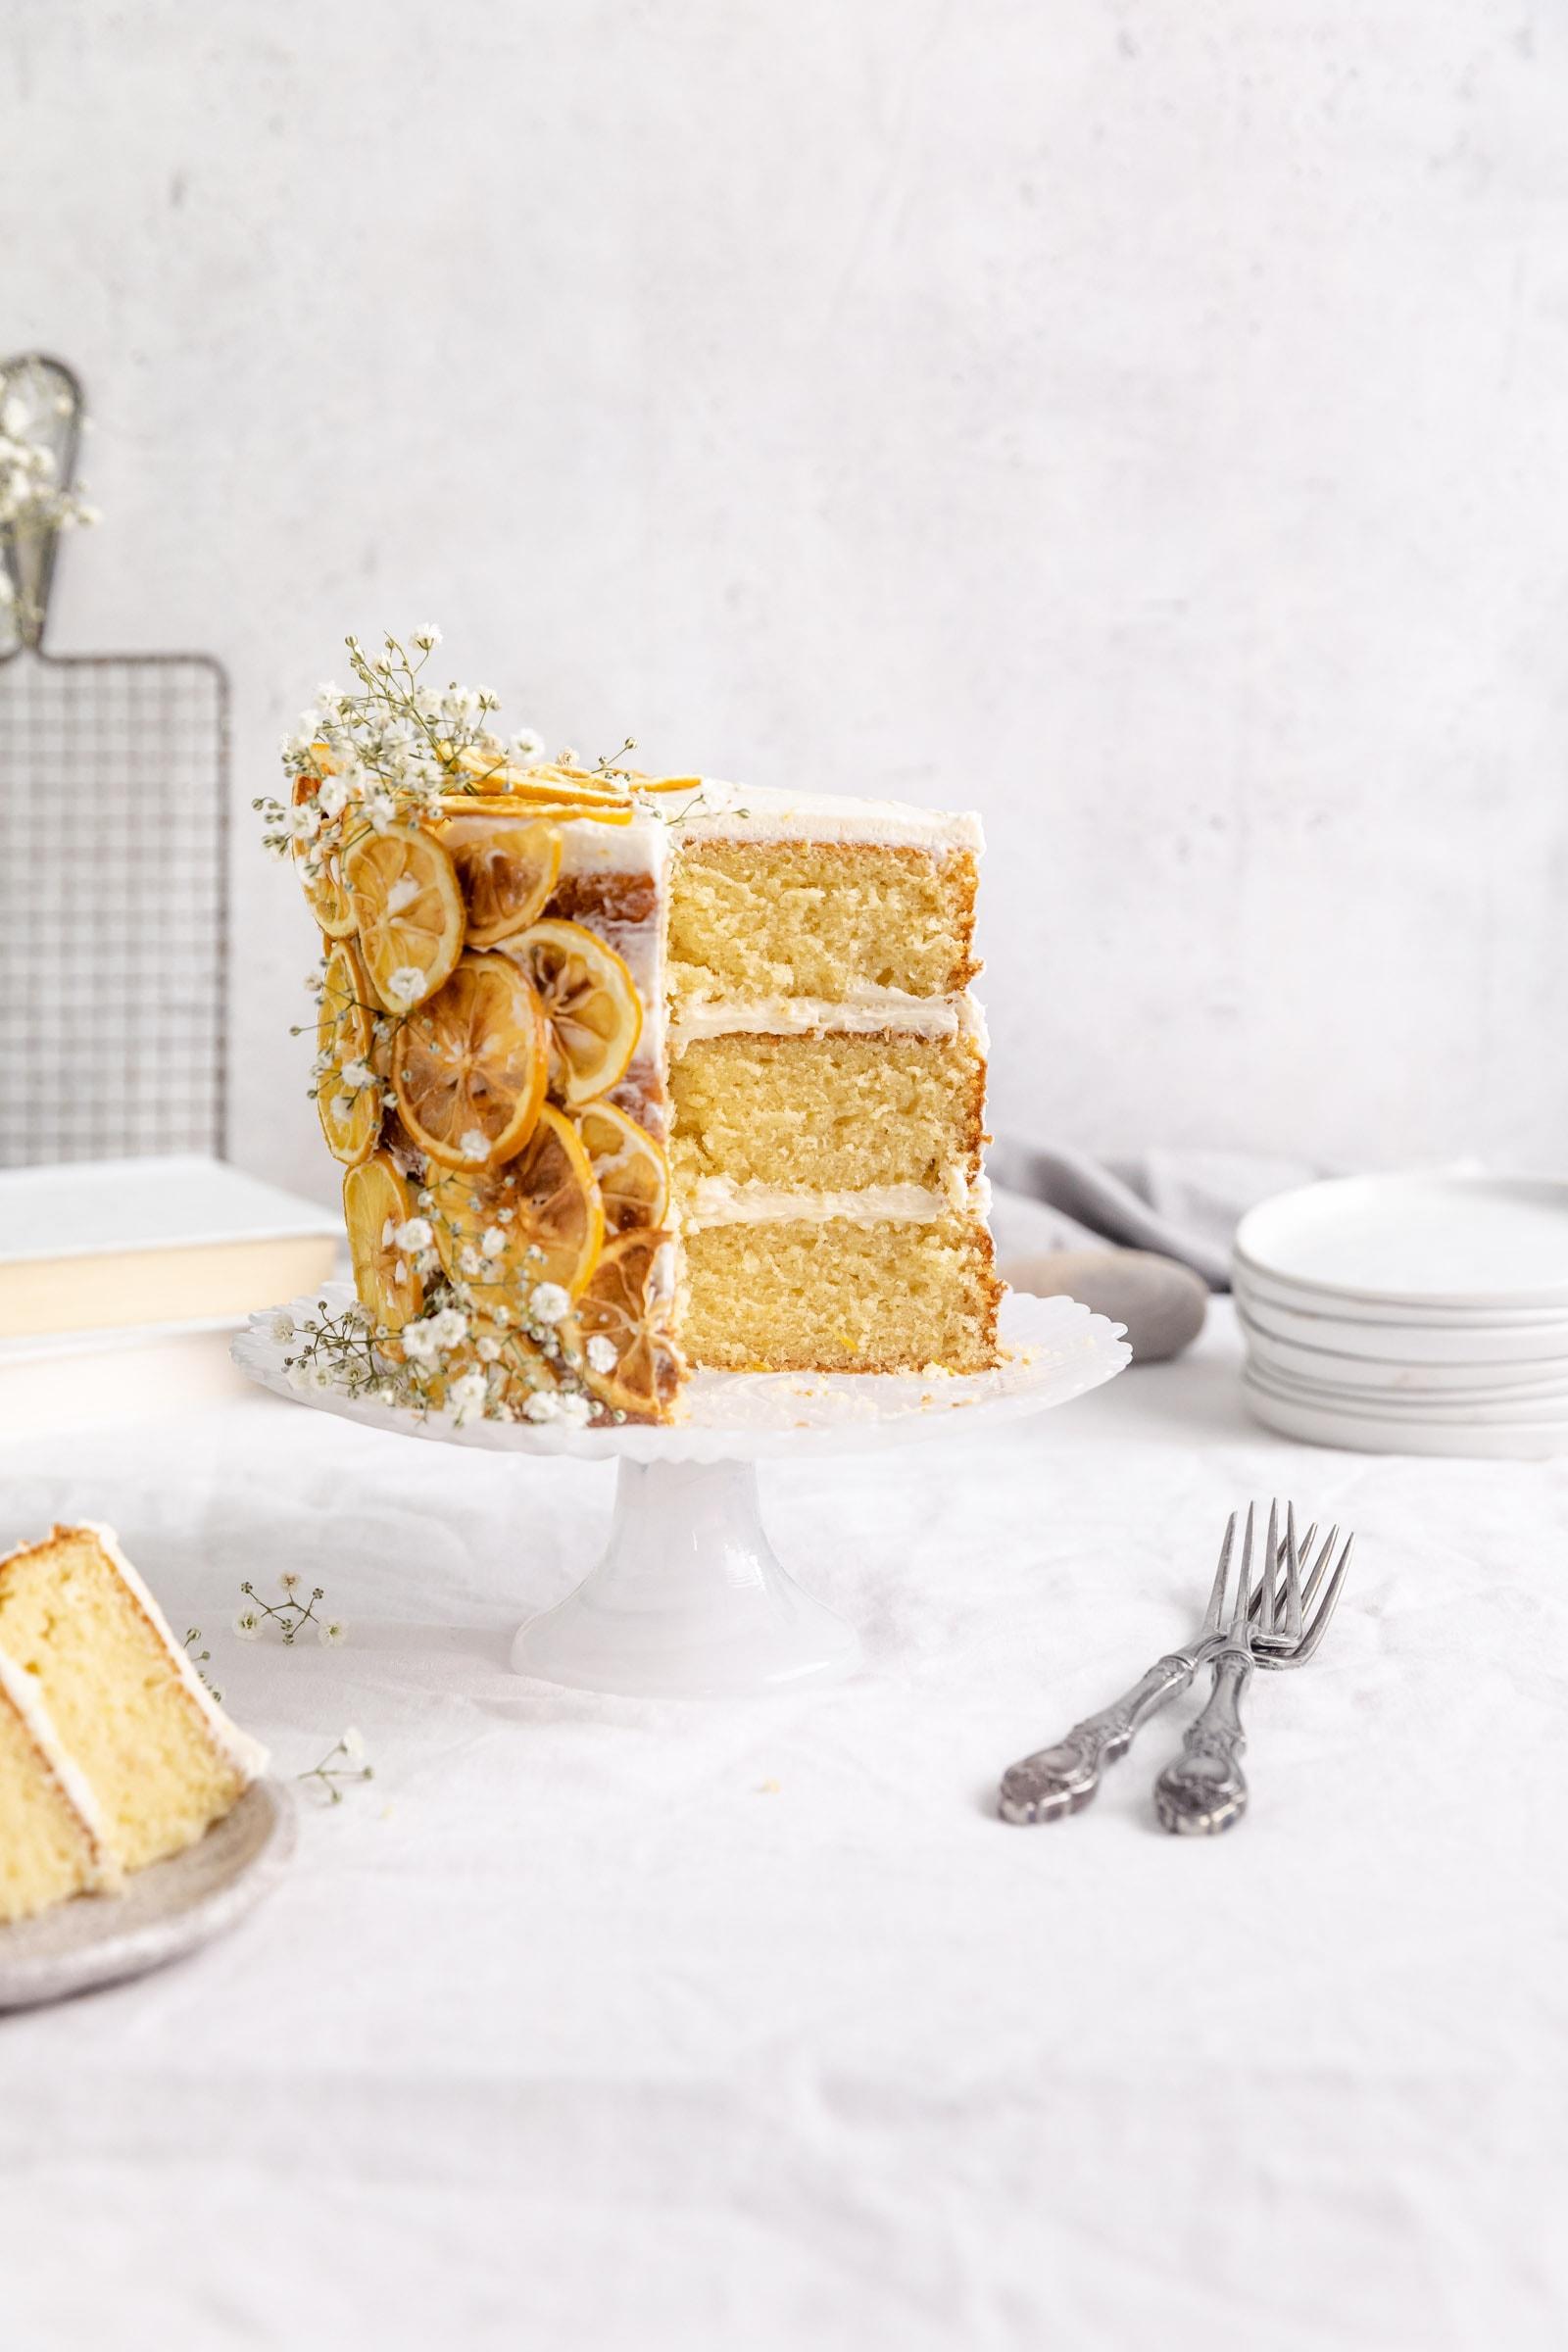 lemon layer cake on a cake stand